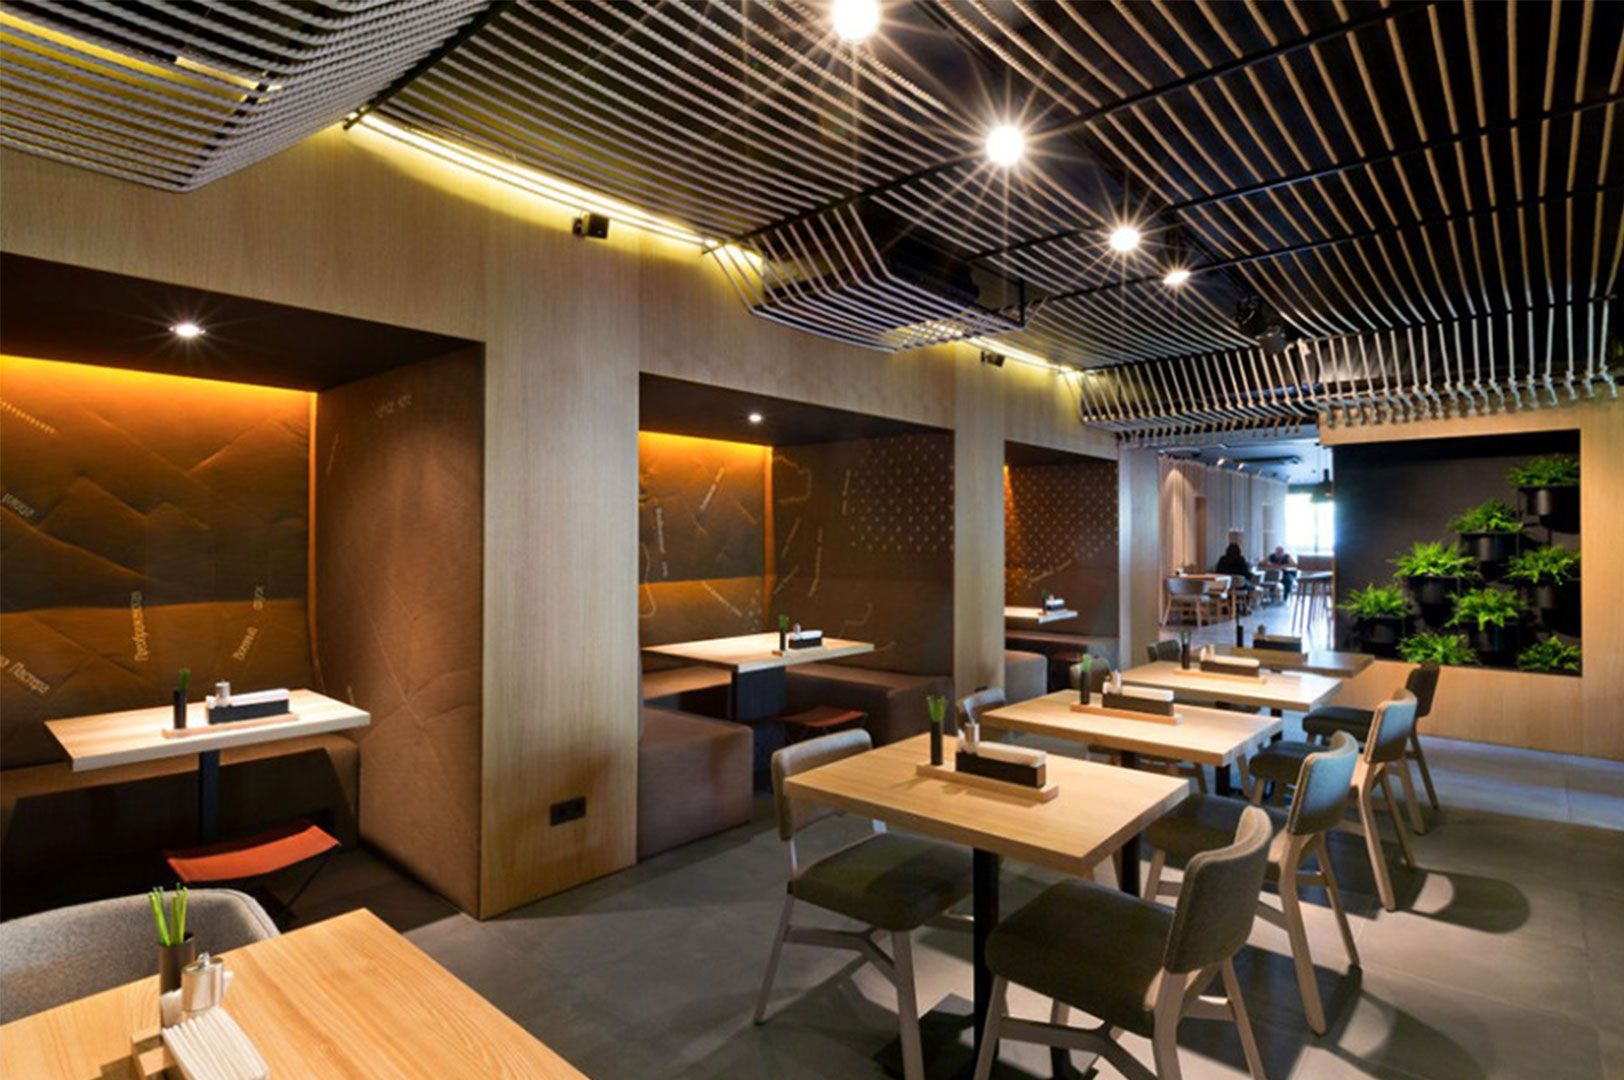 Decoration Cafe Moderne | Salon De Luxe Moderne Meilleur Salon ...